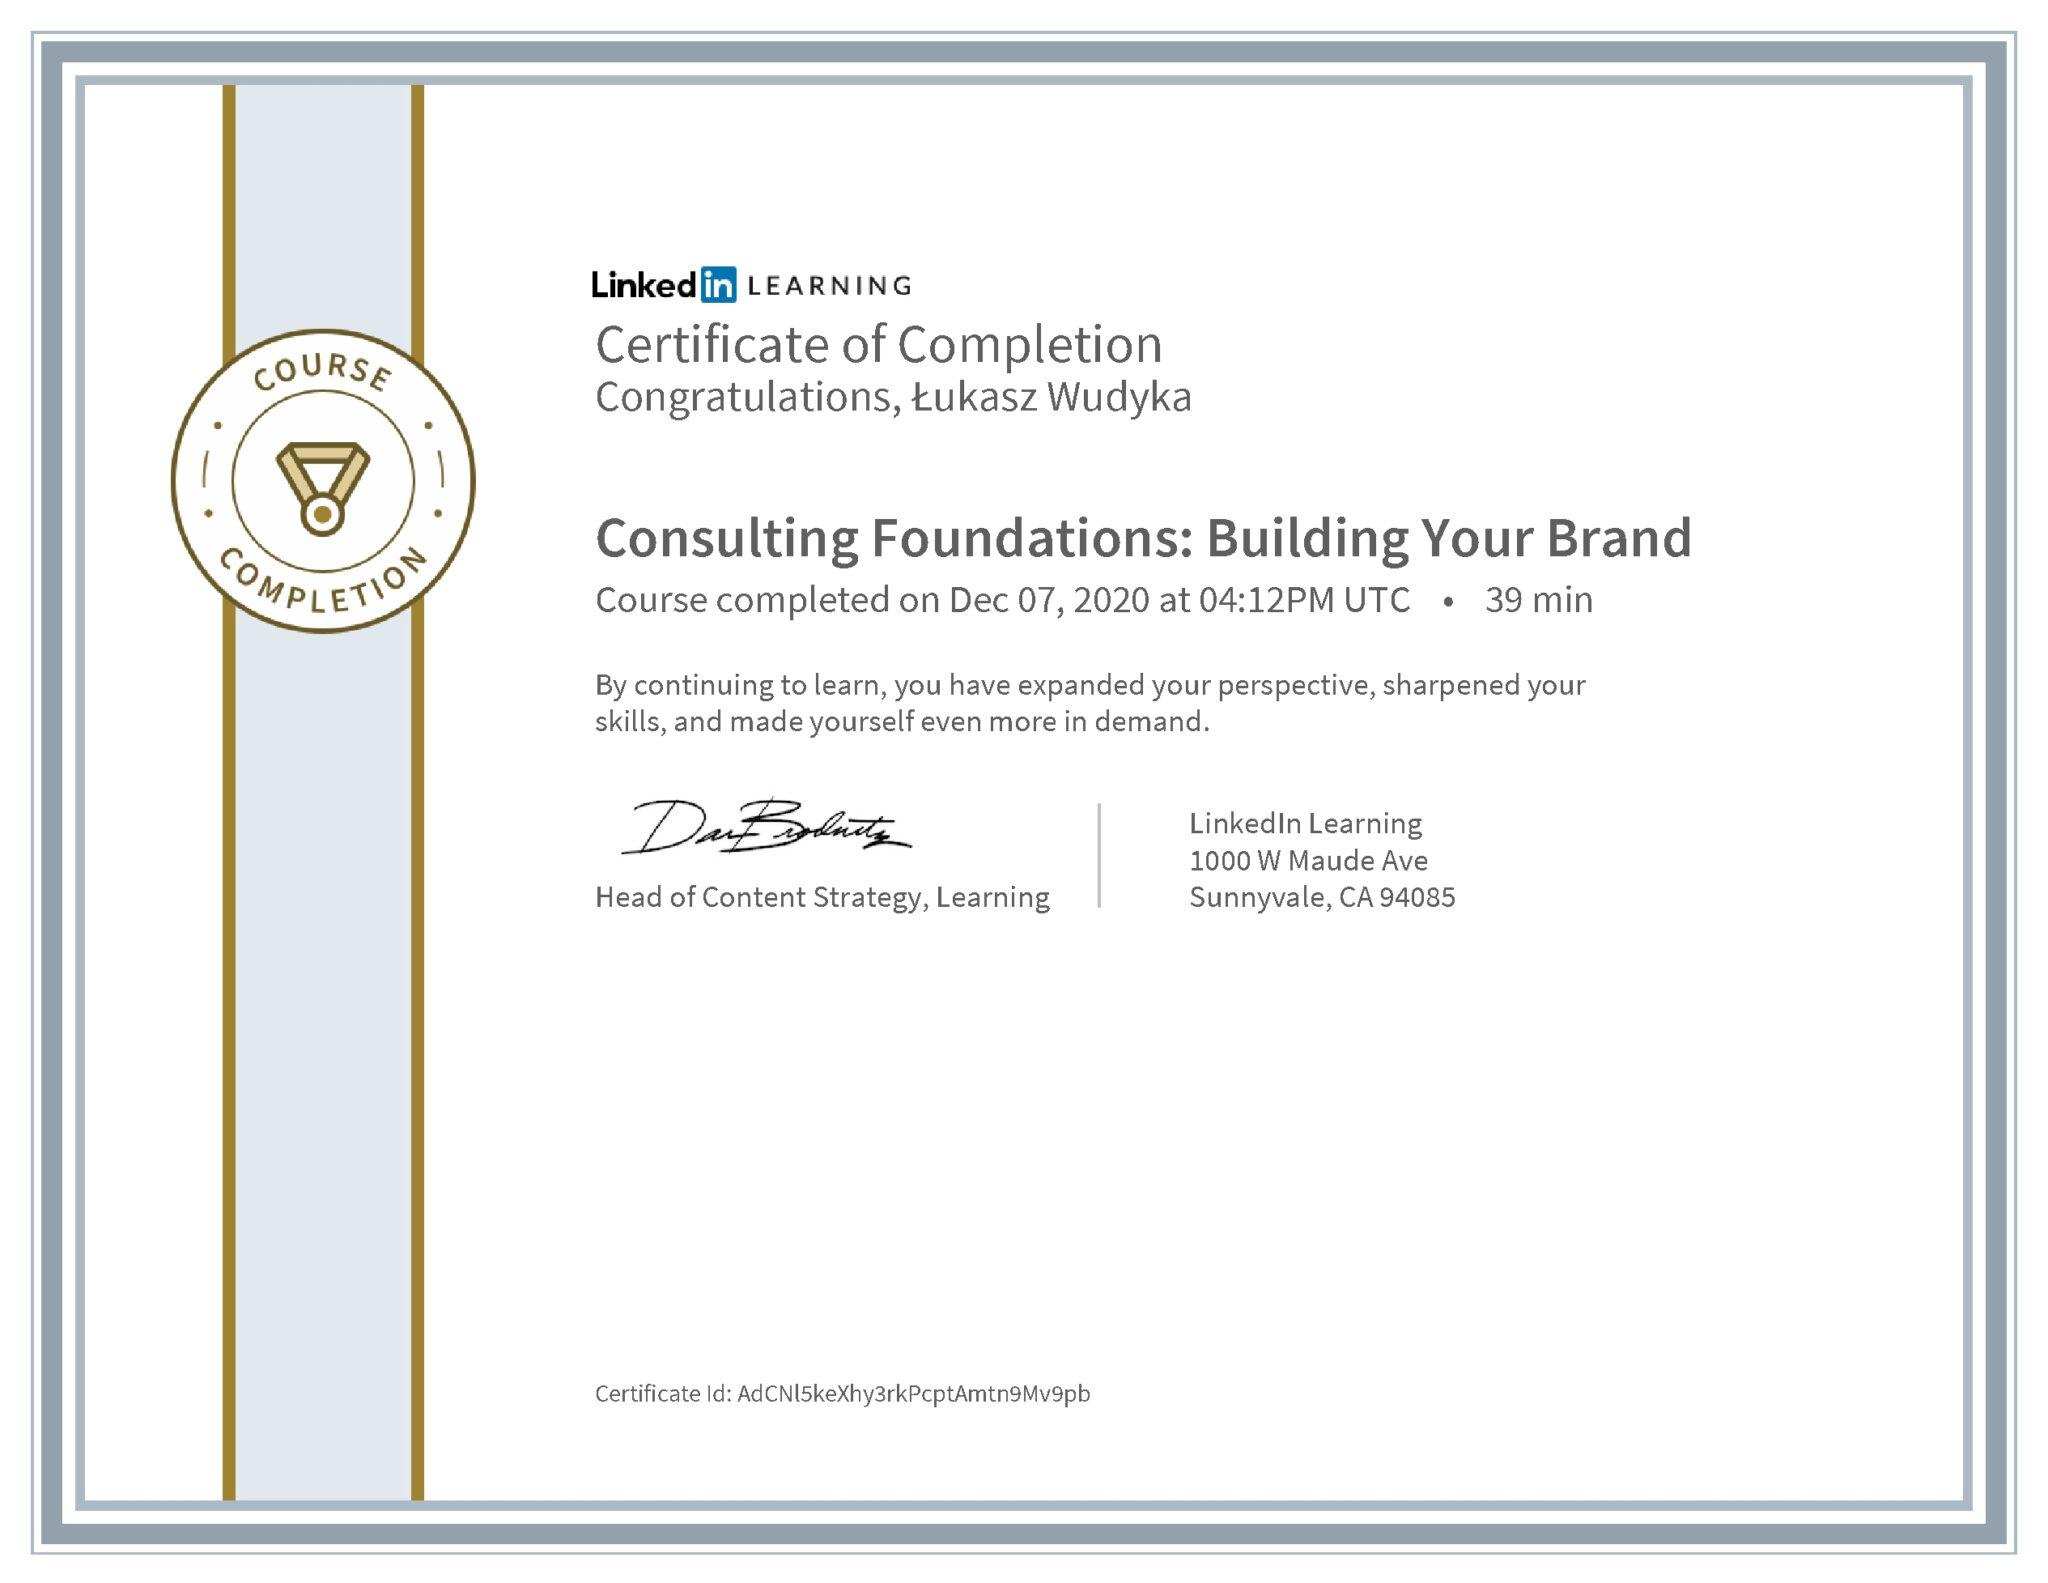 Łukasz Wudyka certyfikat LinkedIn Consulting Foundations: Building Your Brand